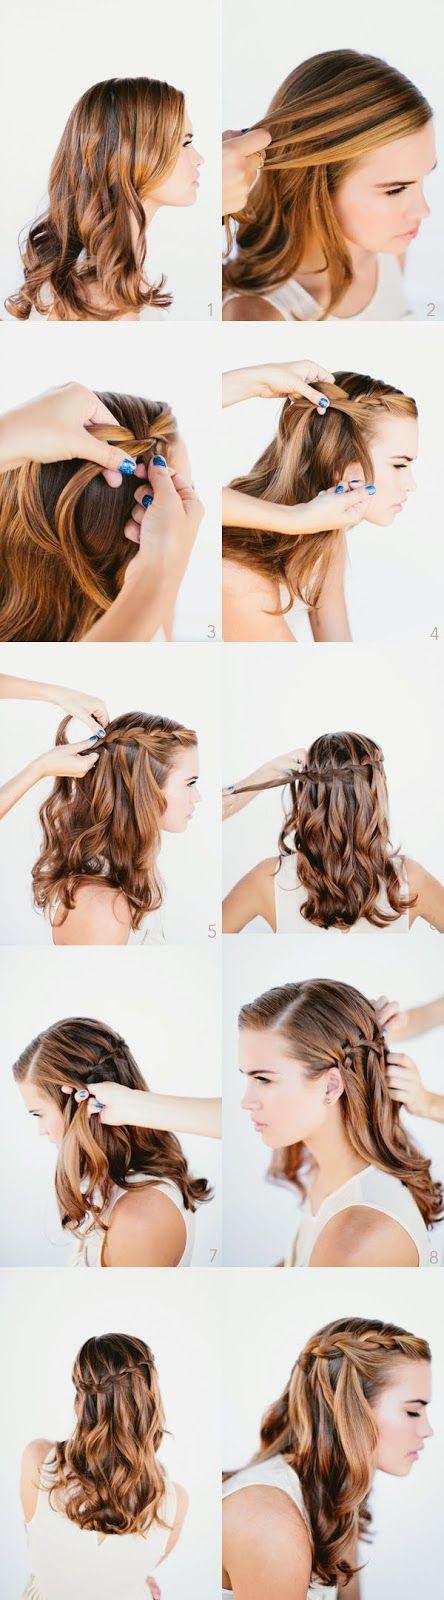 DIY Waterfall Braid-Simple But Powerful Braided Hair Tutorials